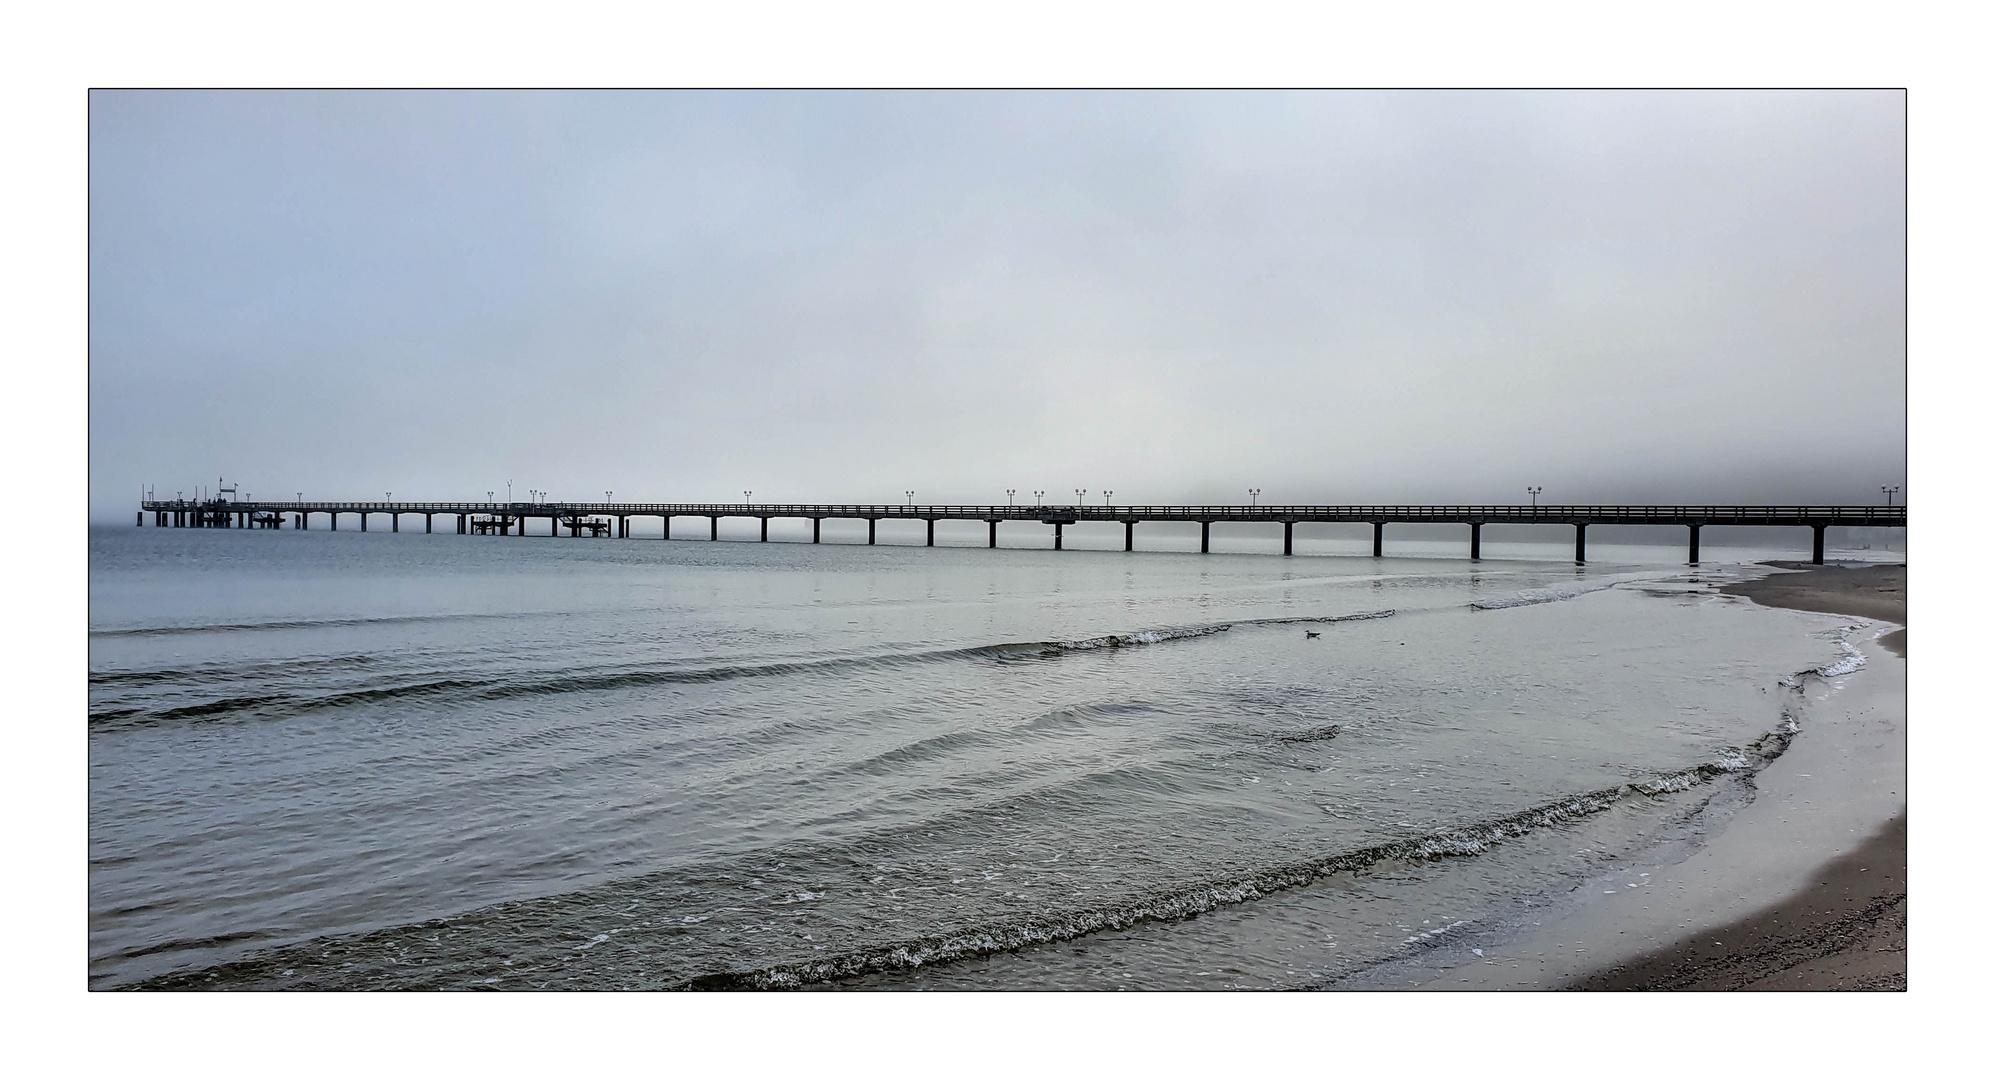 Ostsee Impressionen - Nebel